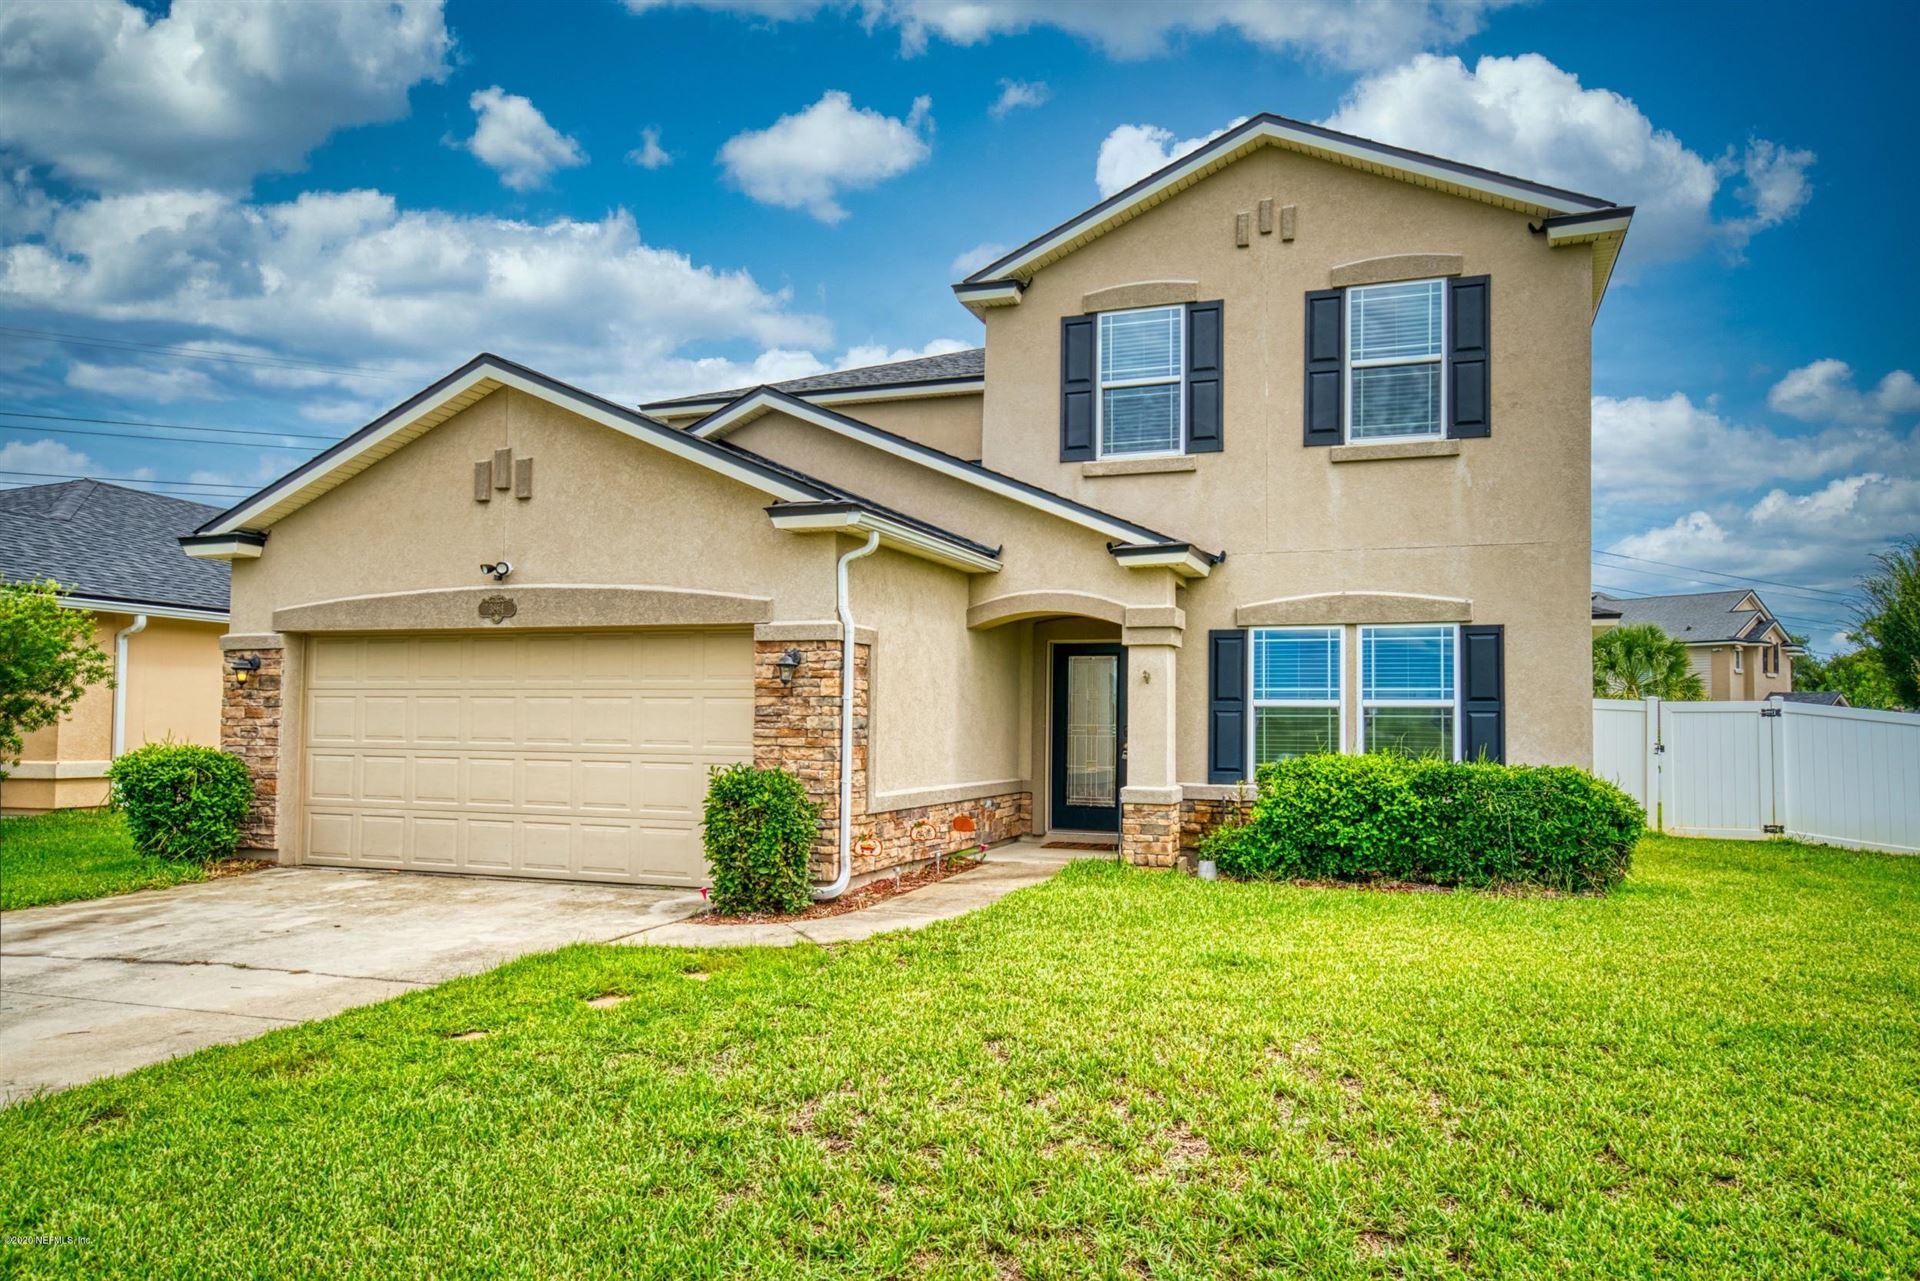 3864 GREAT FALLS LOOP, Middleburg, FL 32068 - MLS#: 1069639